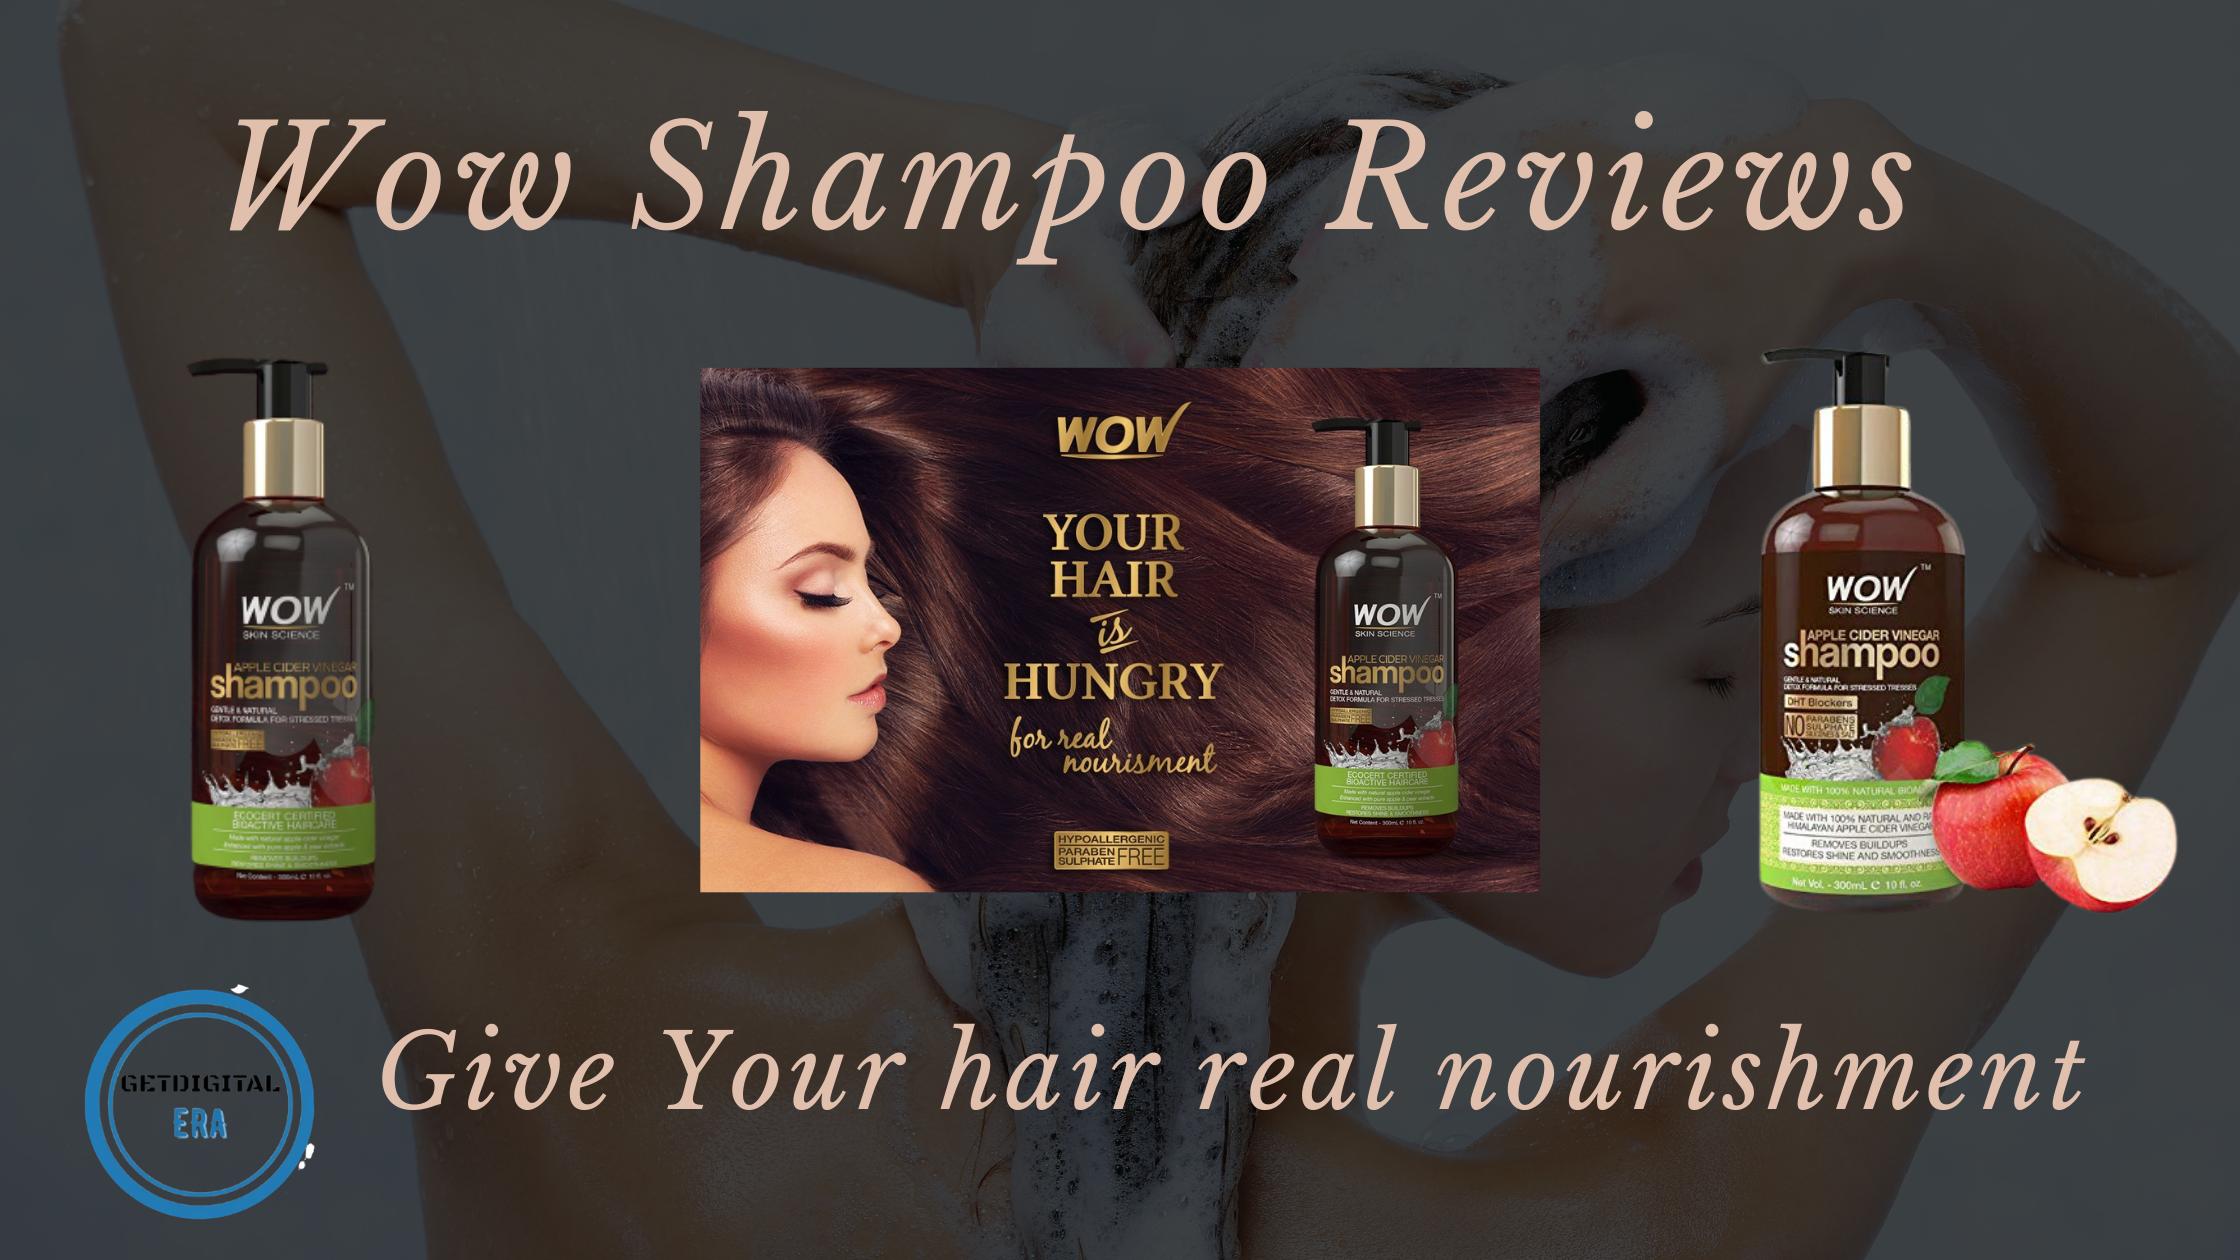 Wow Shampoo Reviews